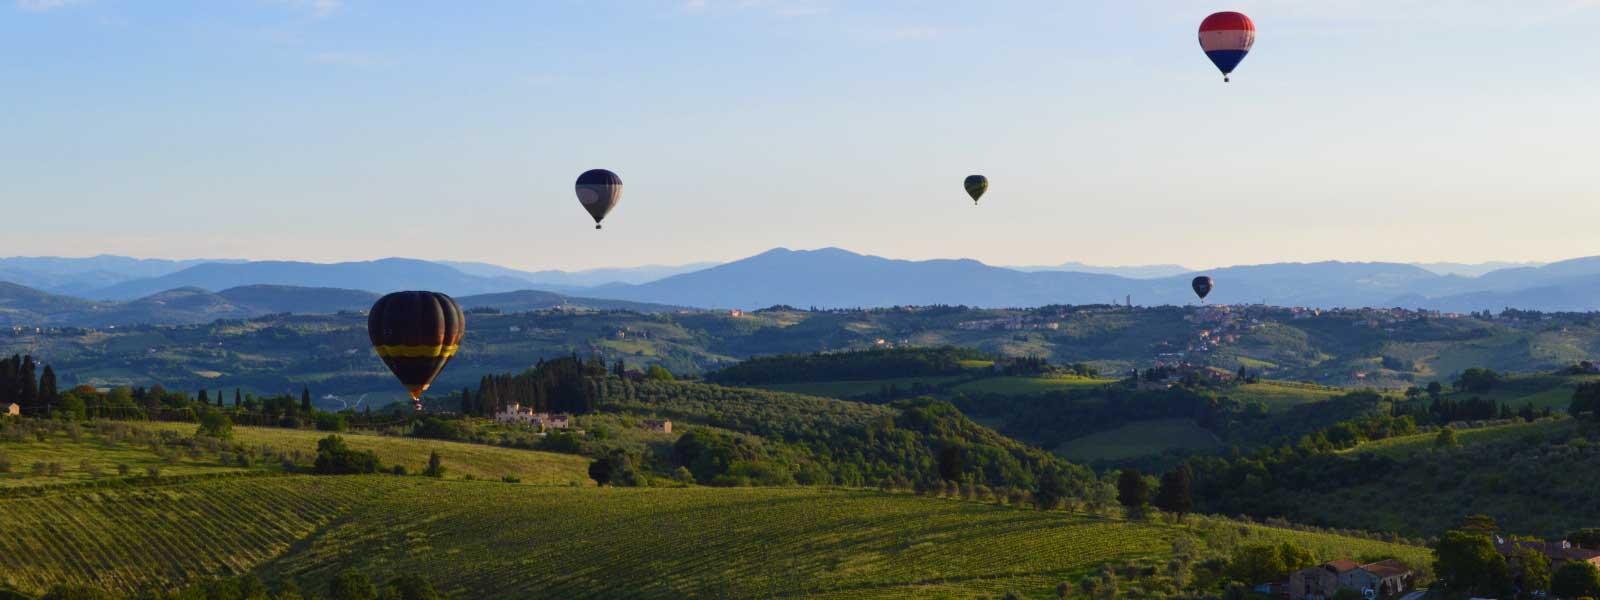 balloon-fleet-in-flight-over-the-tuscan-countryside